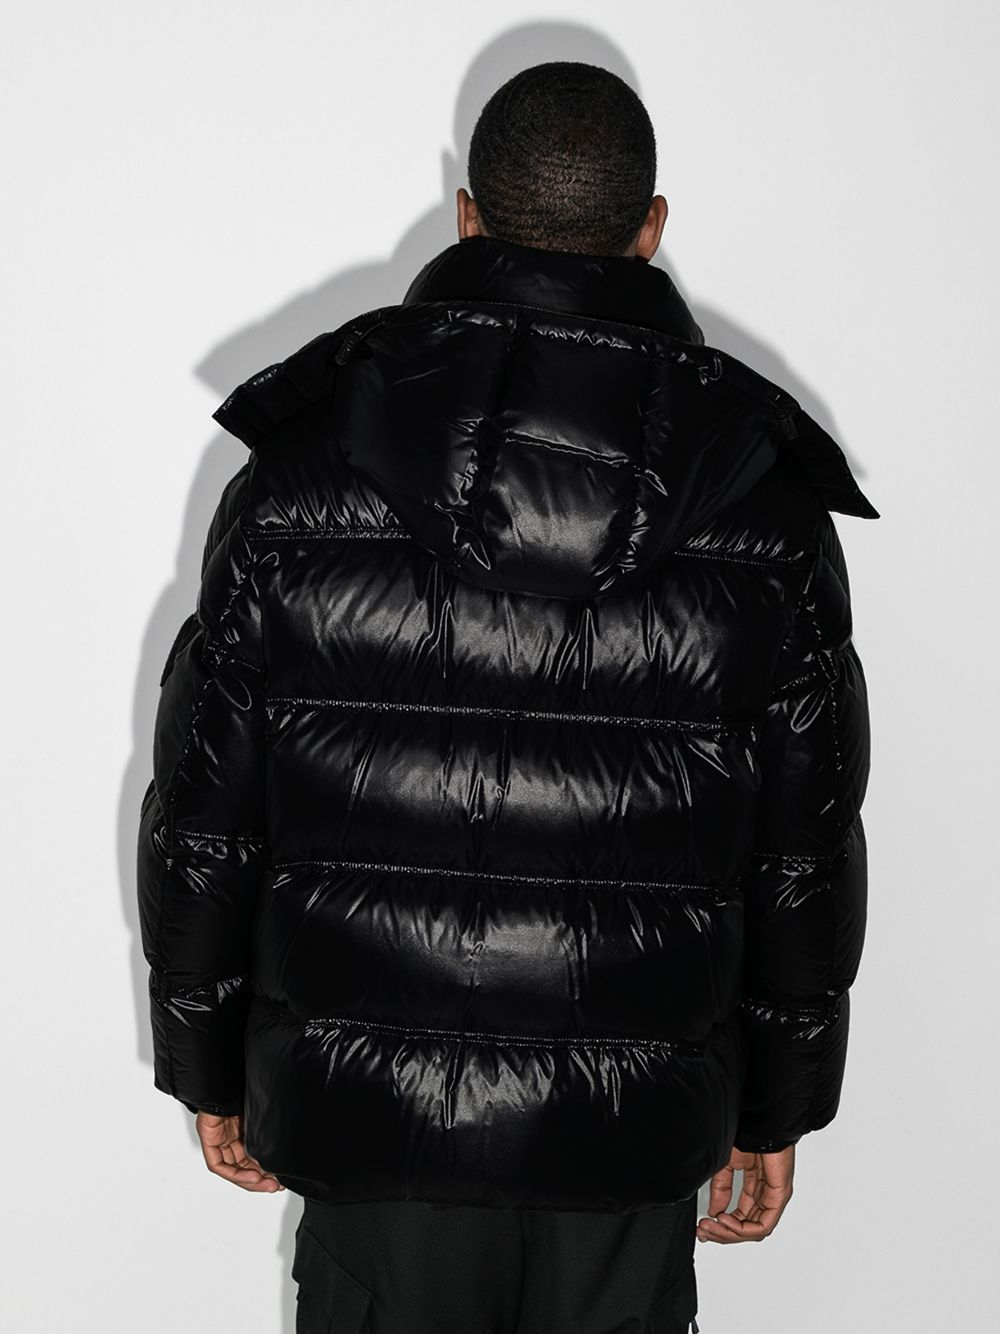 Black Tethys patented puffer jacket  featuring classic hood MONCLER GENIUS |  | TETHYS 1B521-00-68950999